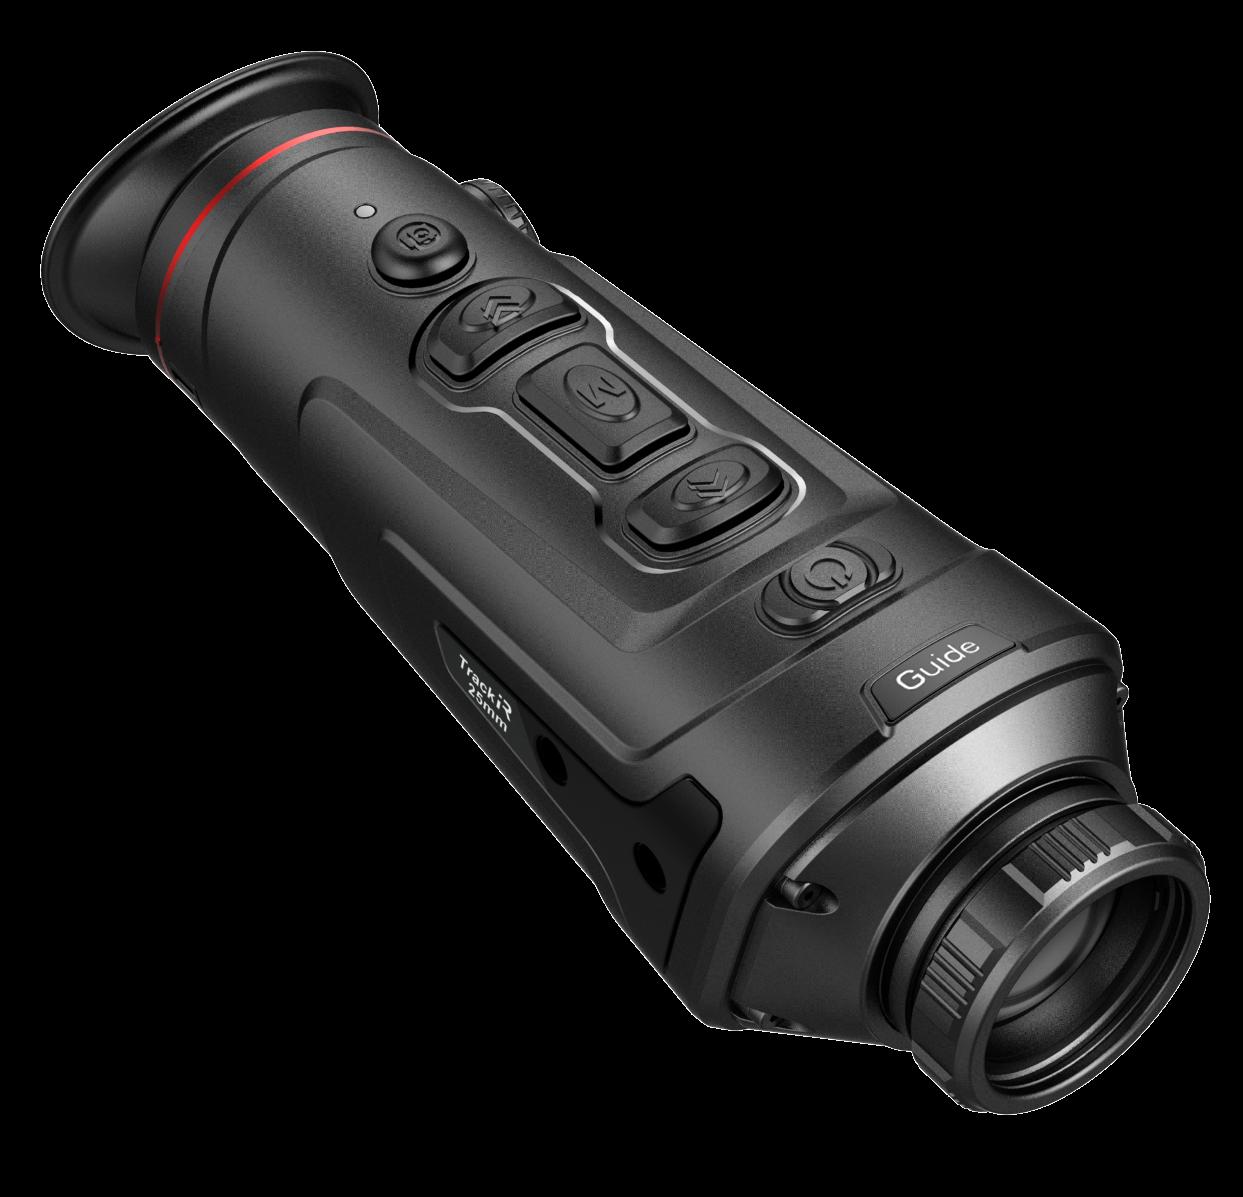 Monokular termowizyjny GUIDE TrackIR 25mm